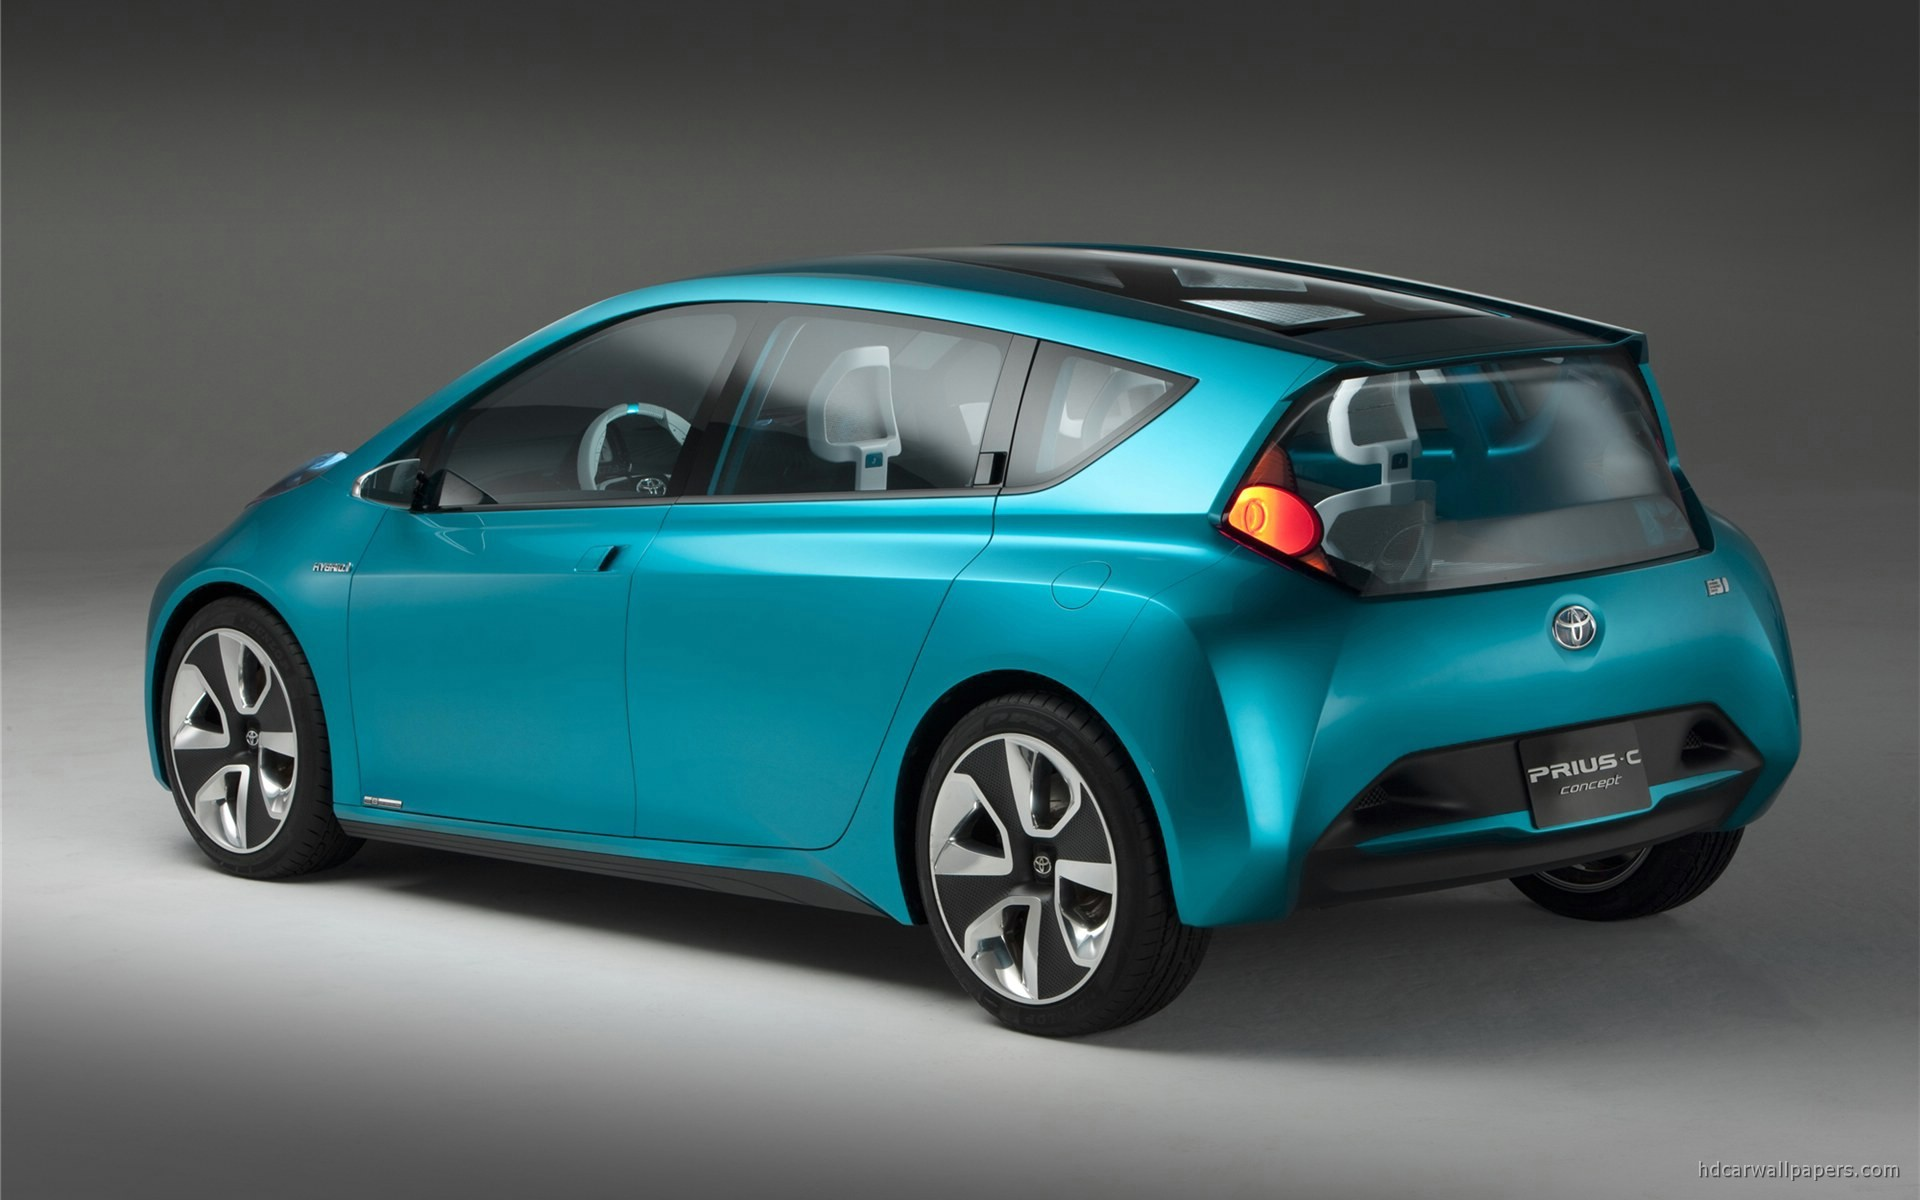 2011 Toyota Prius C Concept 2 Wallpaper Hd Car